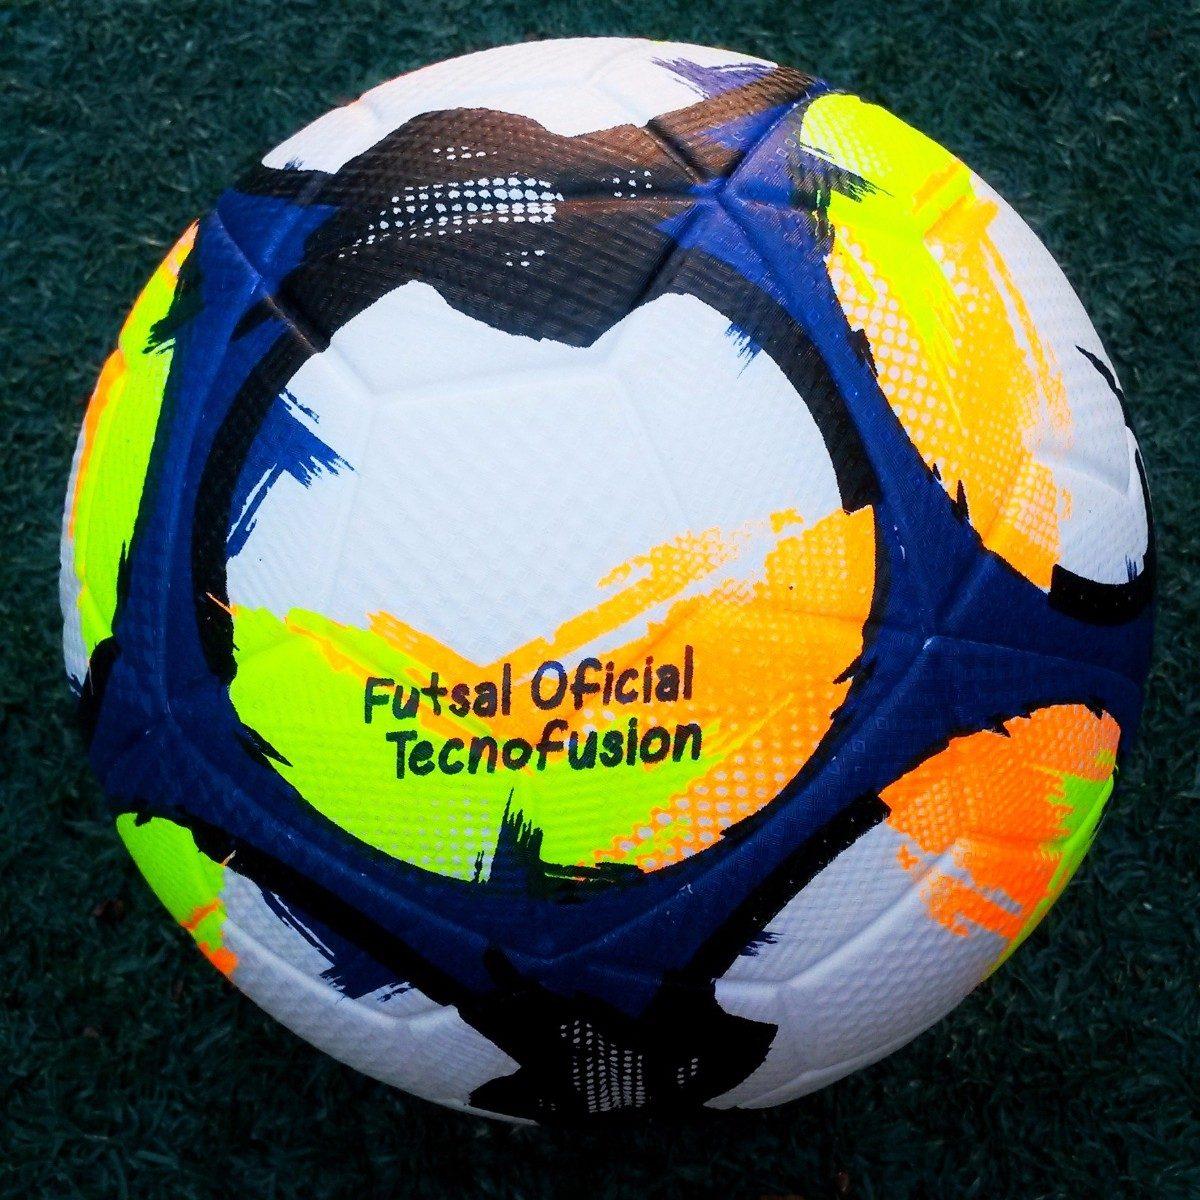 77b7ee3533 Bola Kagiva Tecnofusion Futsal Oficial - R  60